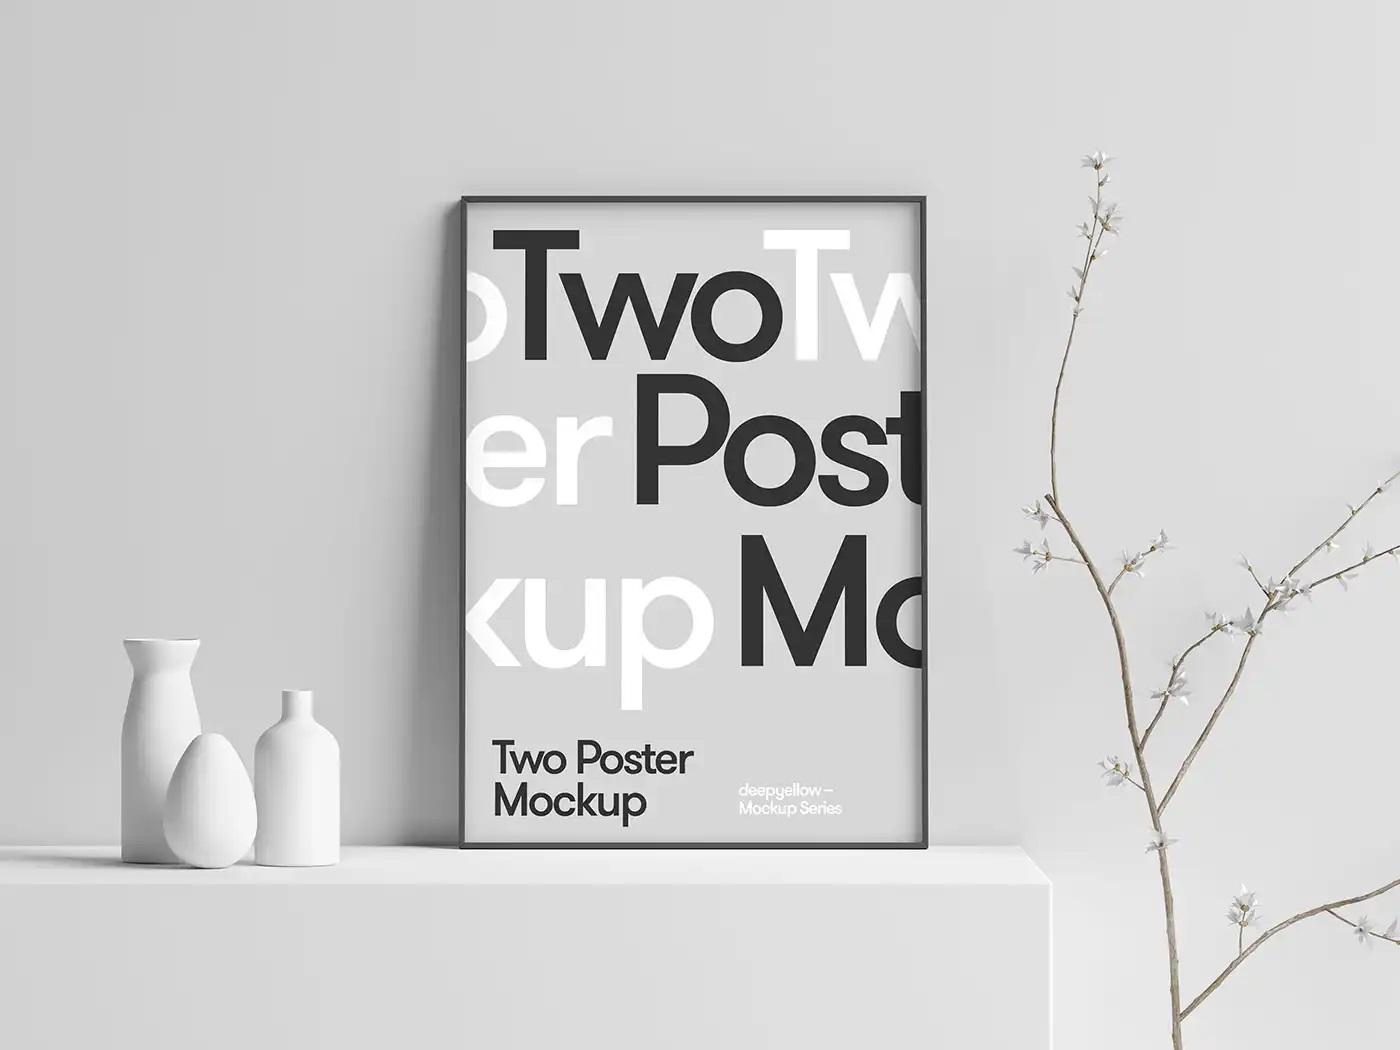 Poster Mockup 02